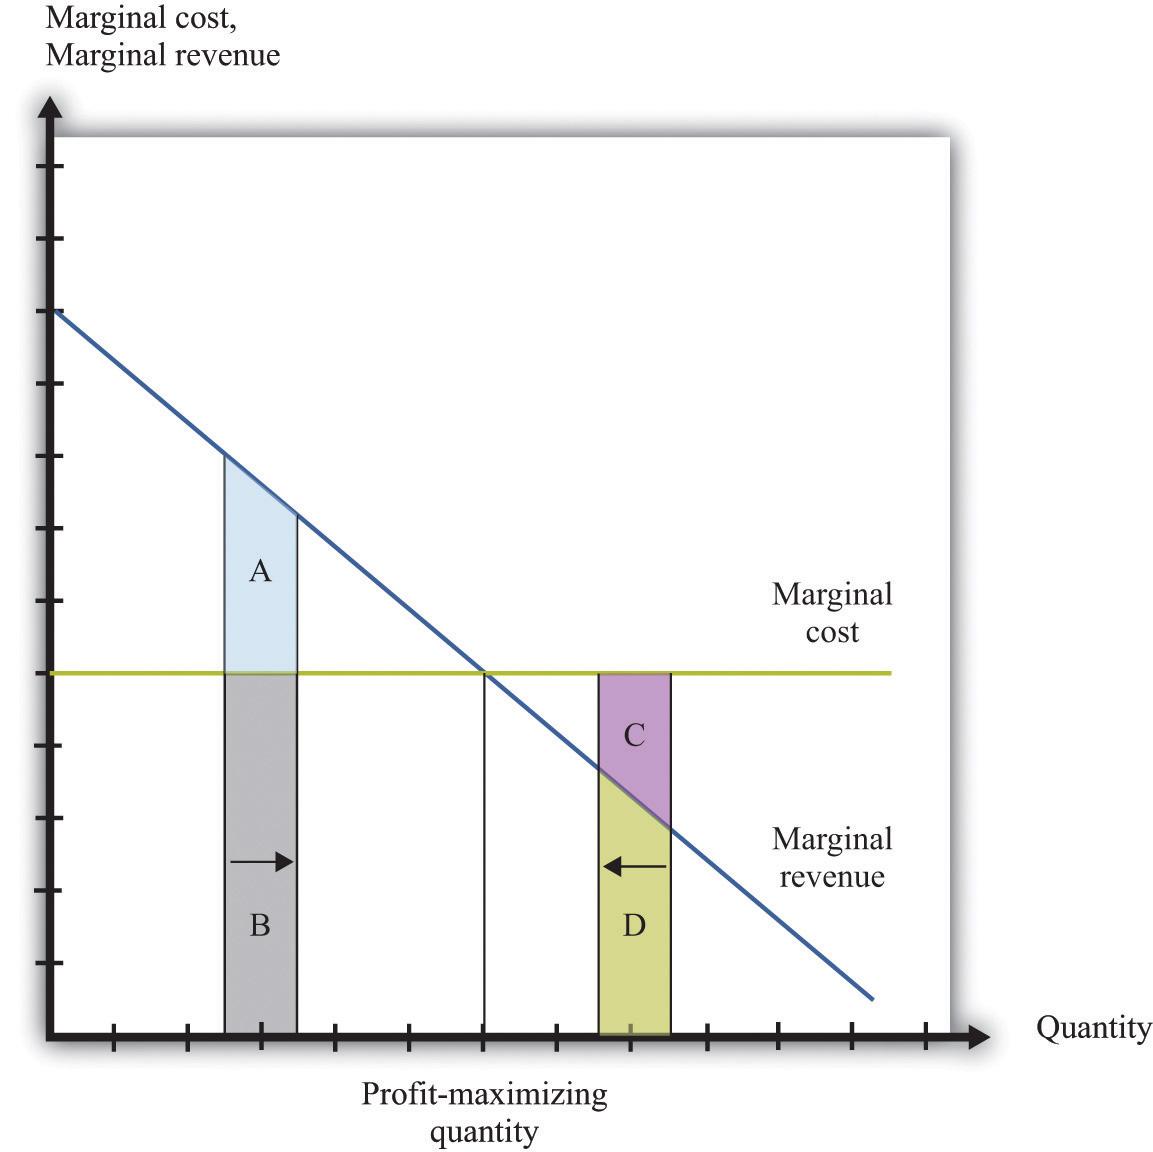 economics marginal cost profit Profit maximization methods in managerial economics profit maximization methods in managerial  when marginal revenue equals marginal cost, marginal profit.